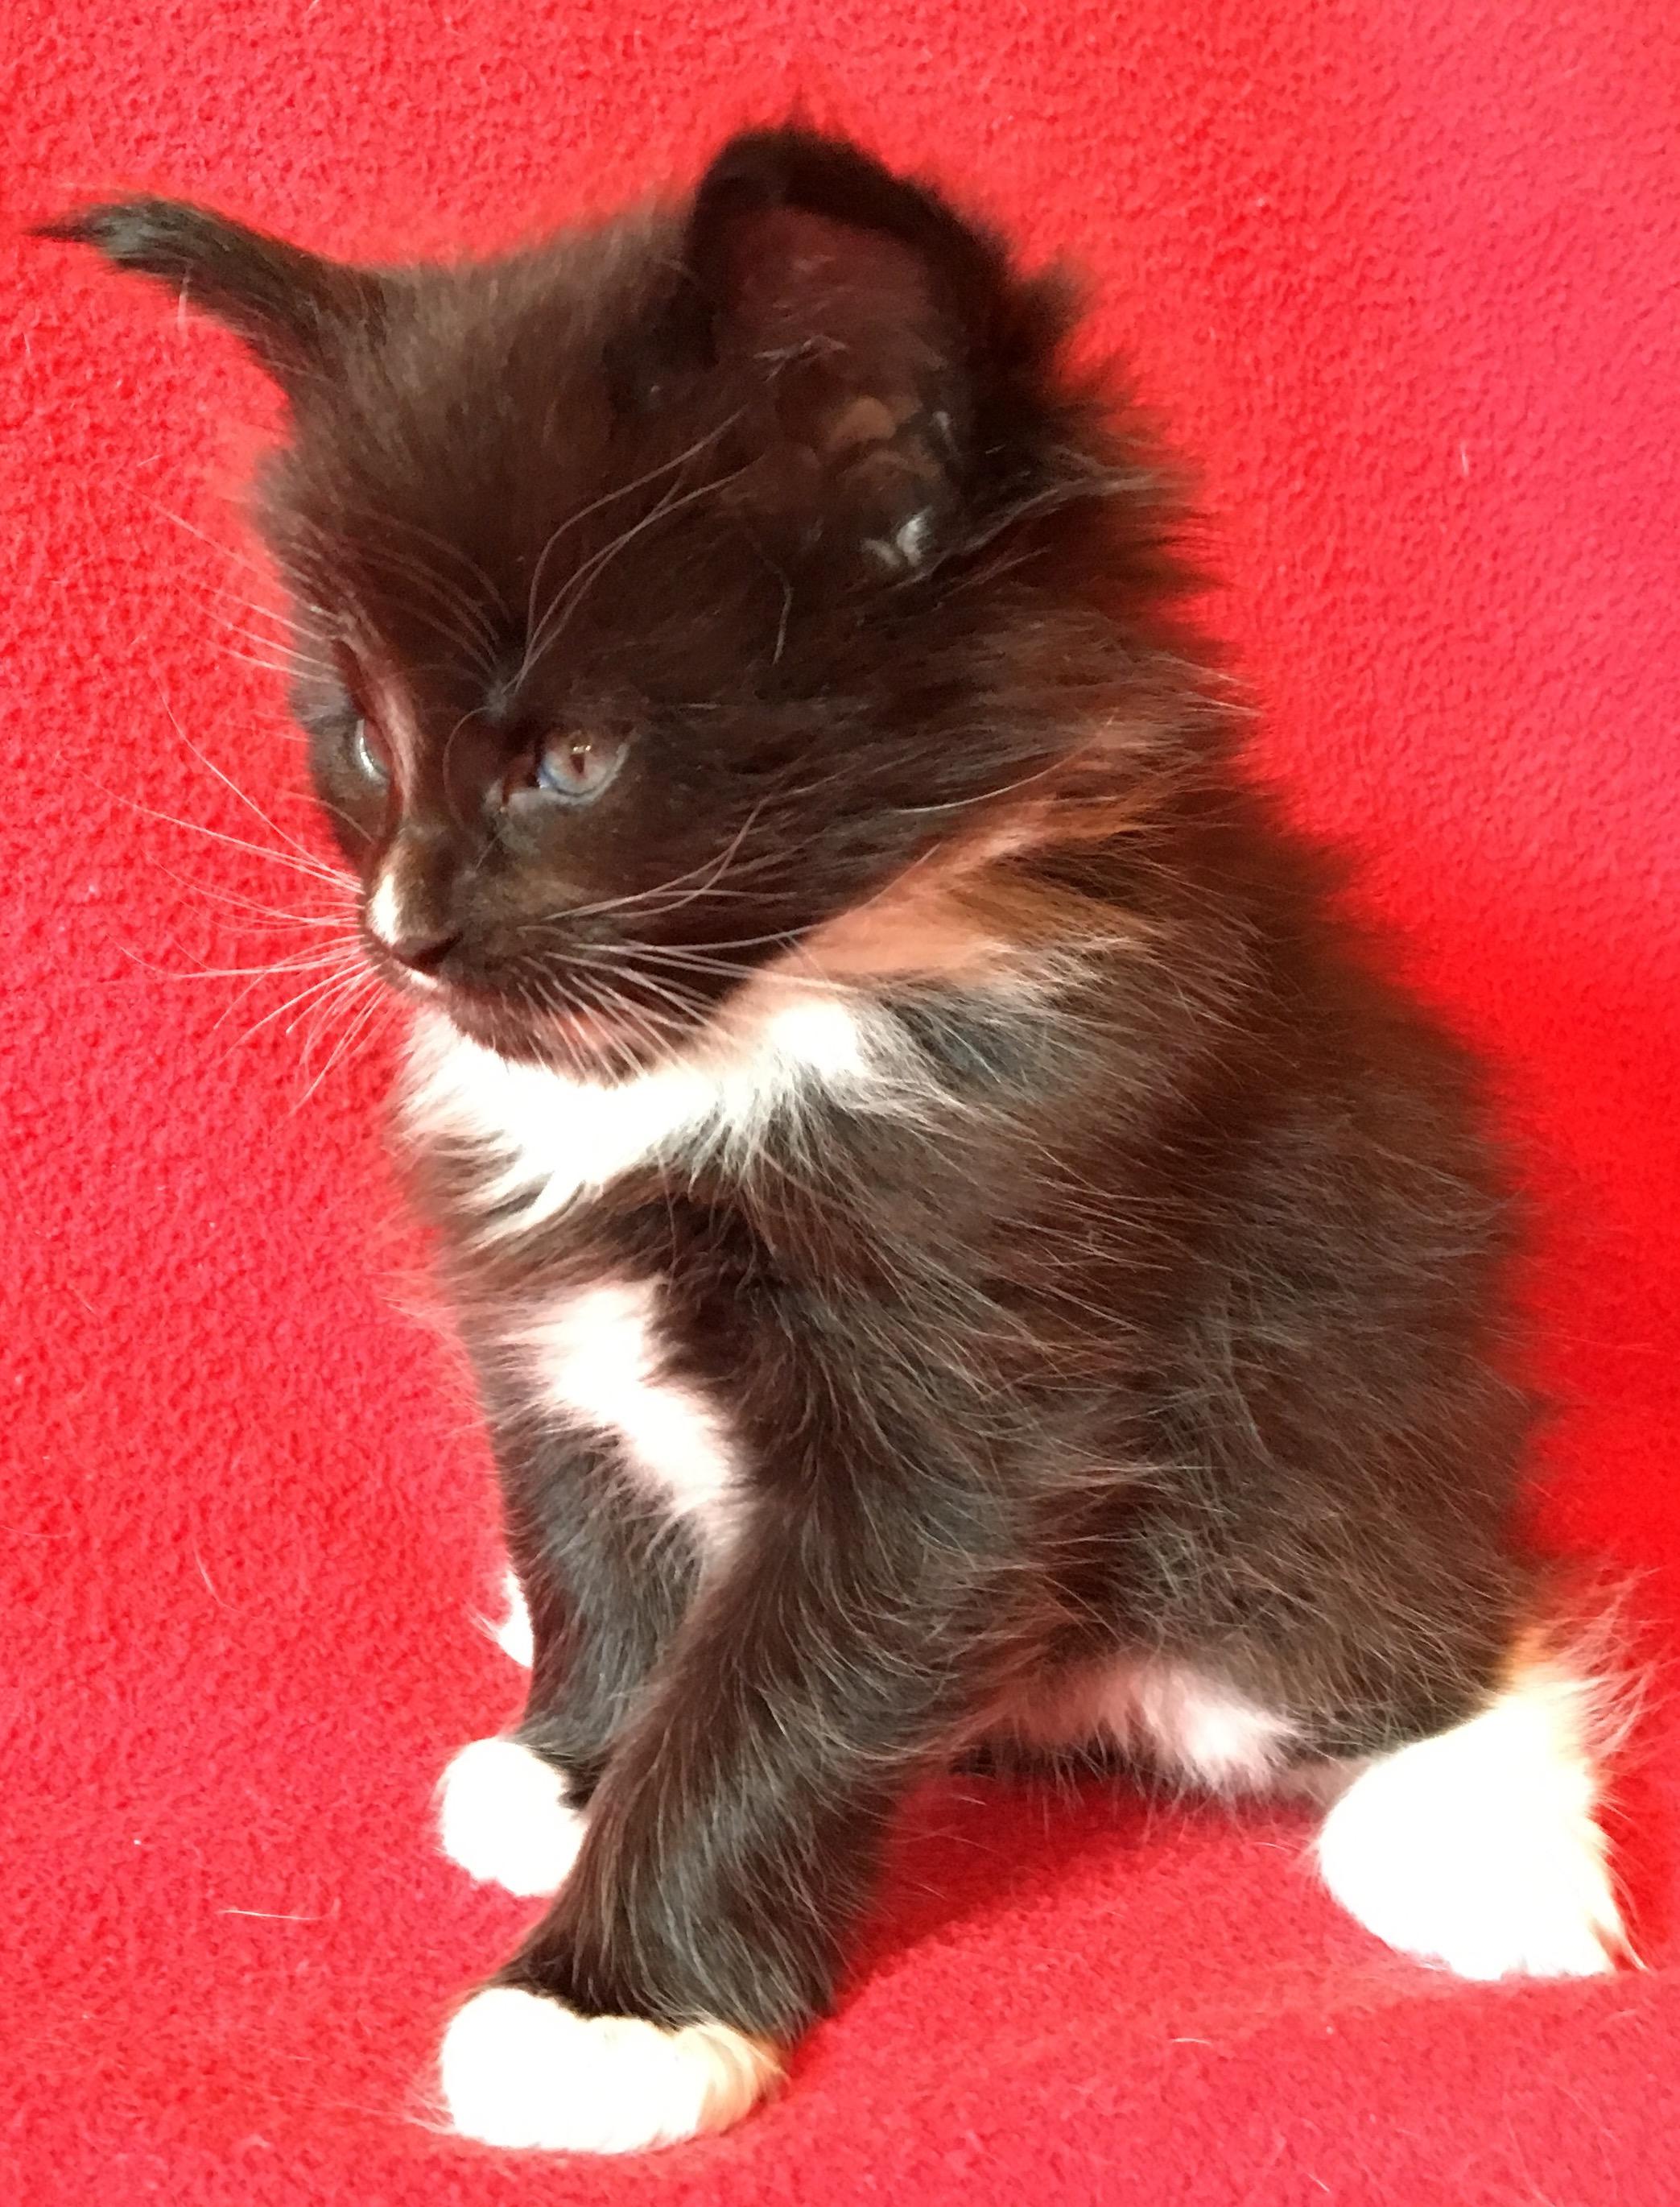 fotka kočky VRH C: Caesar Nikk von Erillian,CZ